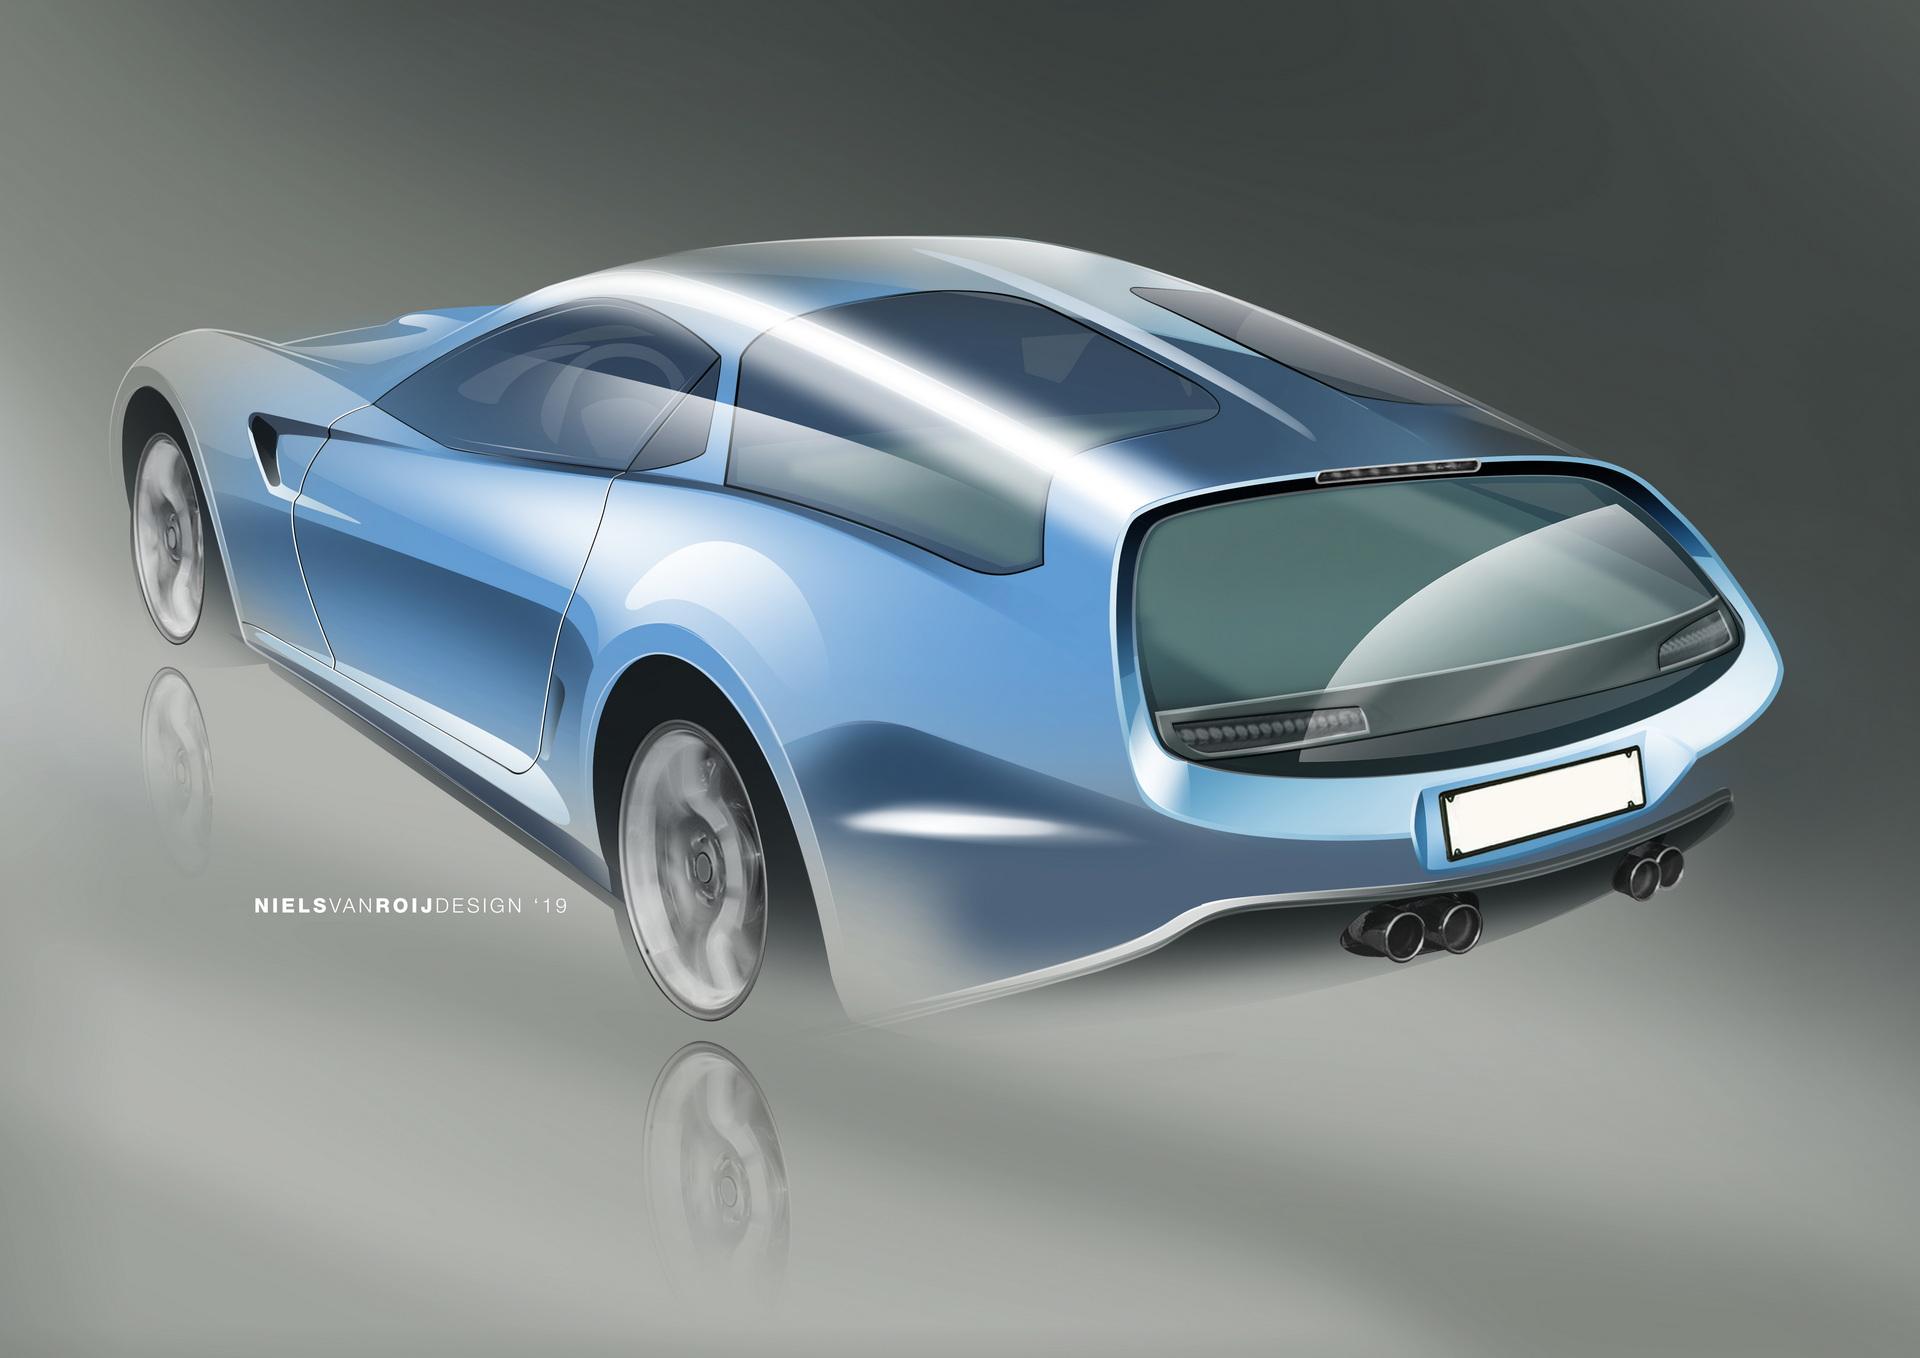 Ferrari-Daytona-Shooting-Brake-Hommage-by-Niels-van-Roij-Design-19